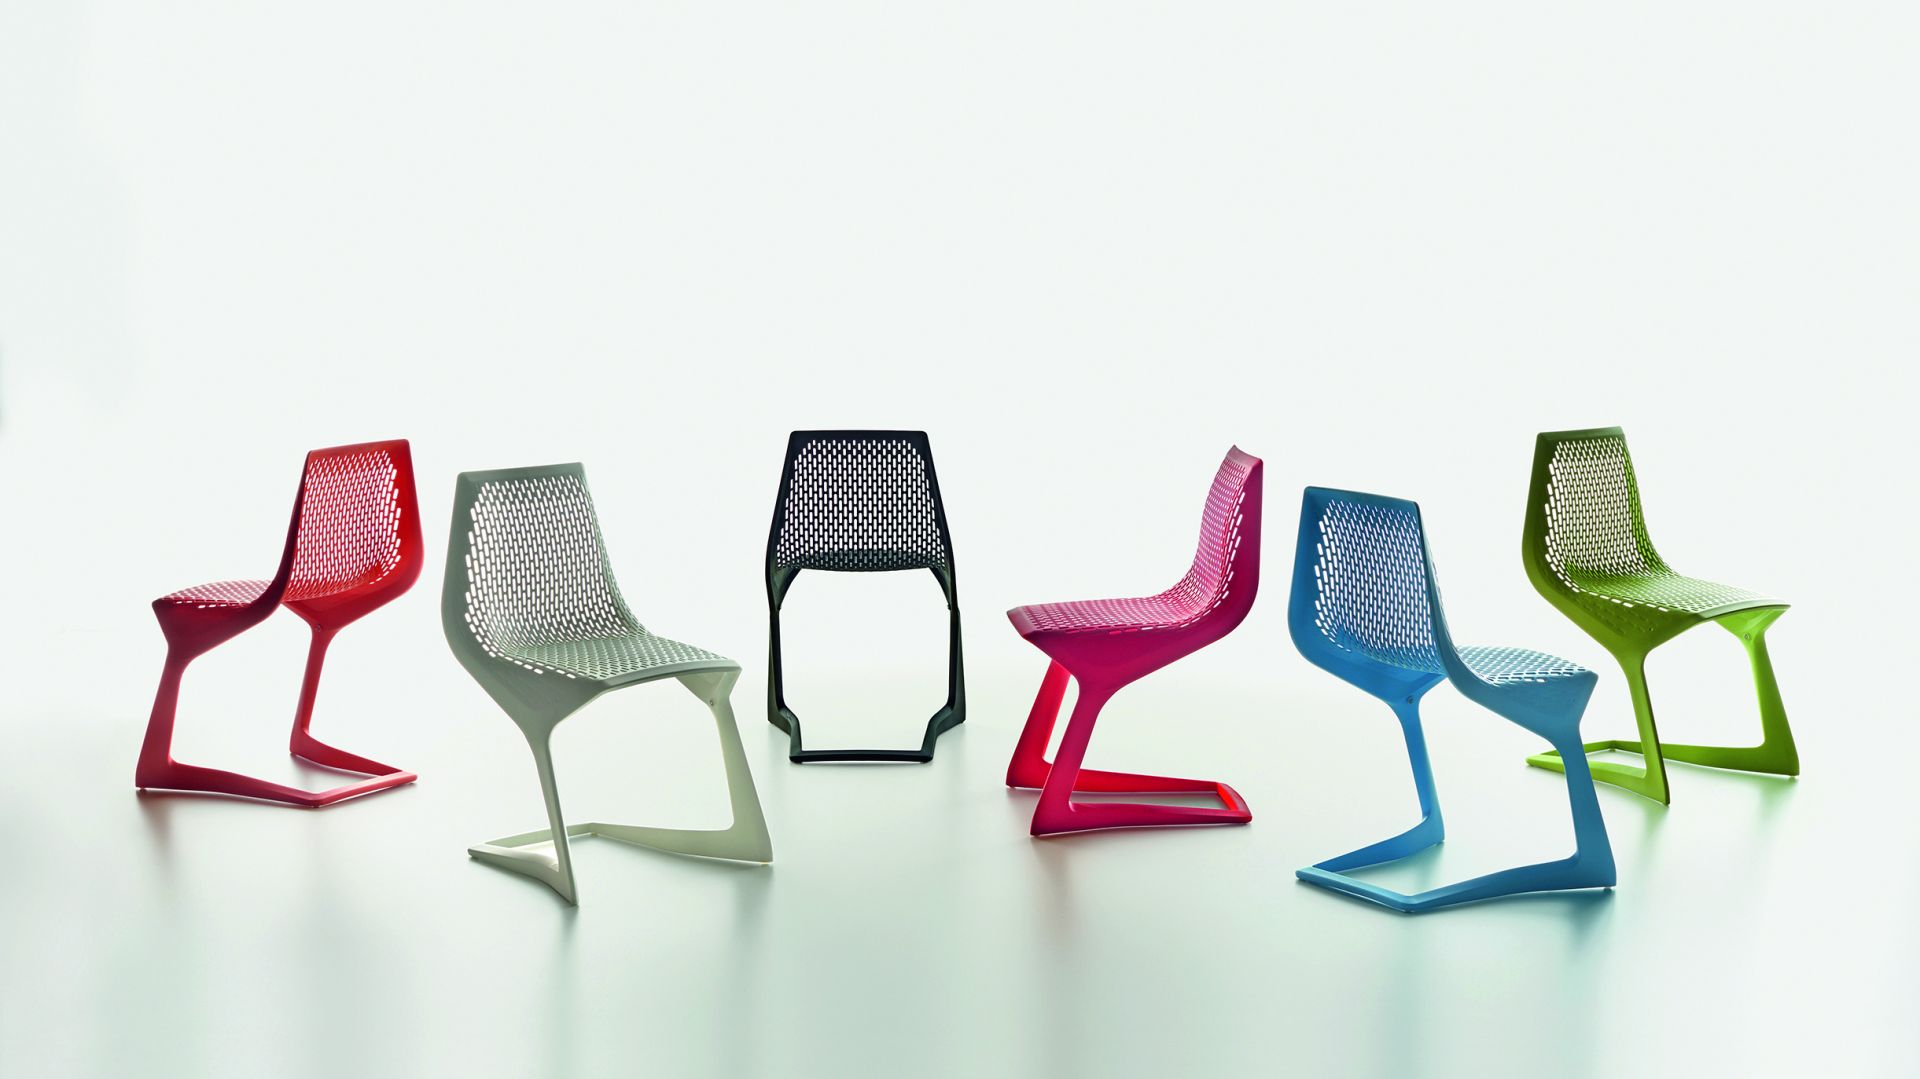 Krzesła z kolekcji Myto. Fot. Plank